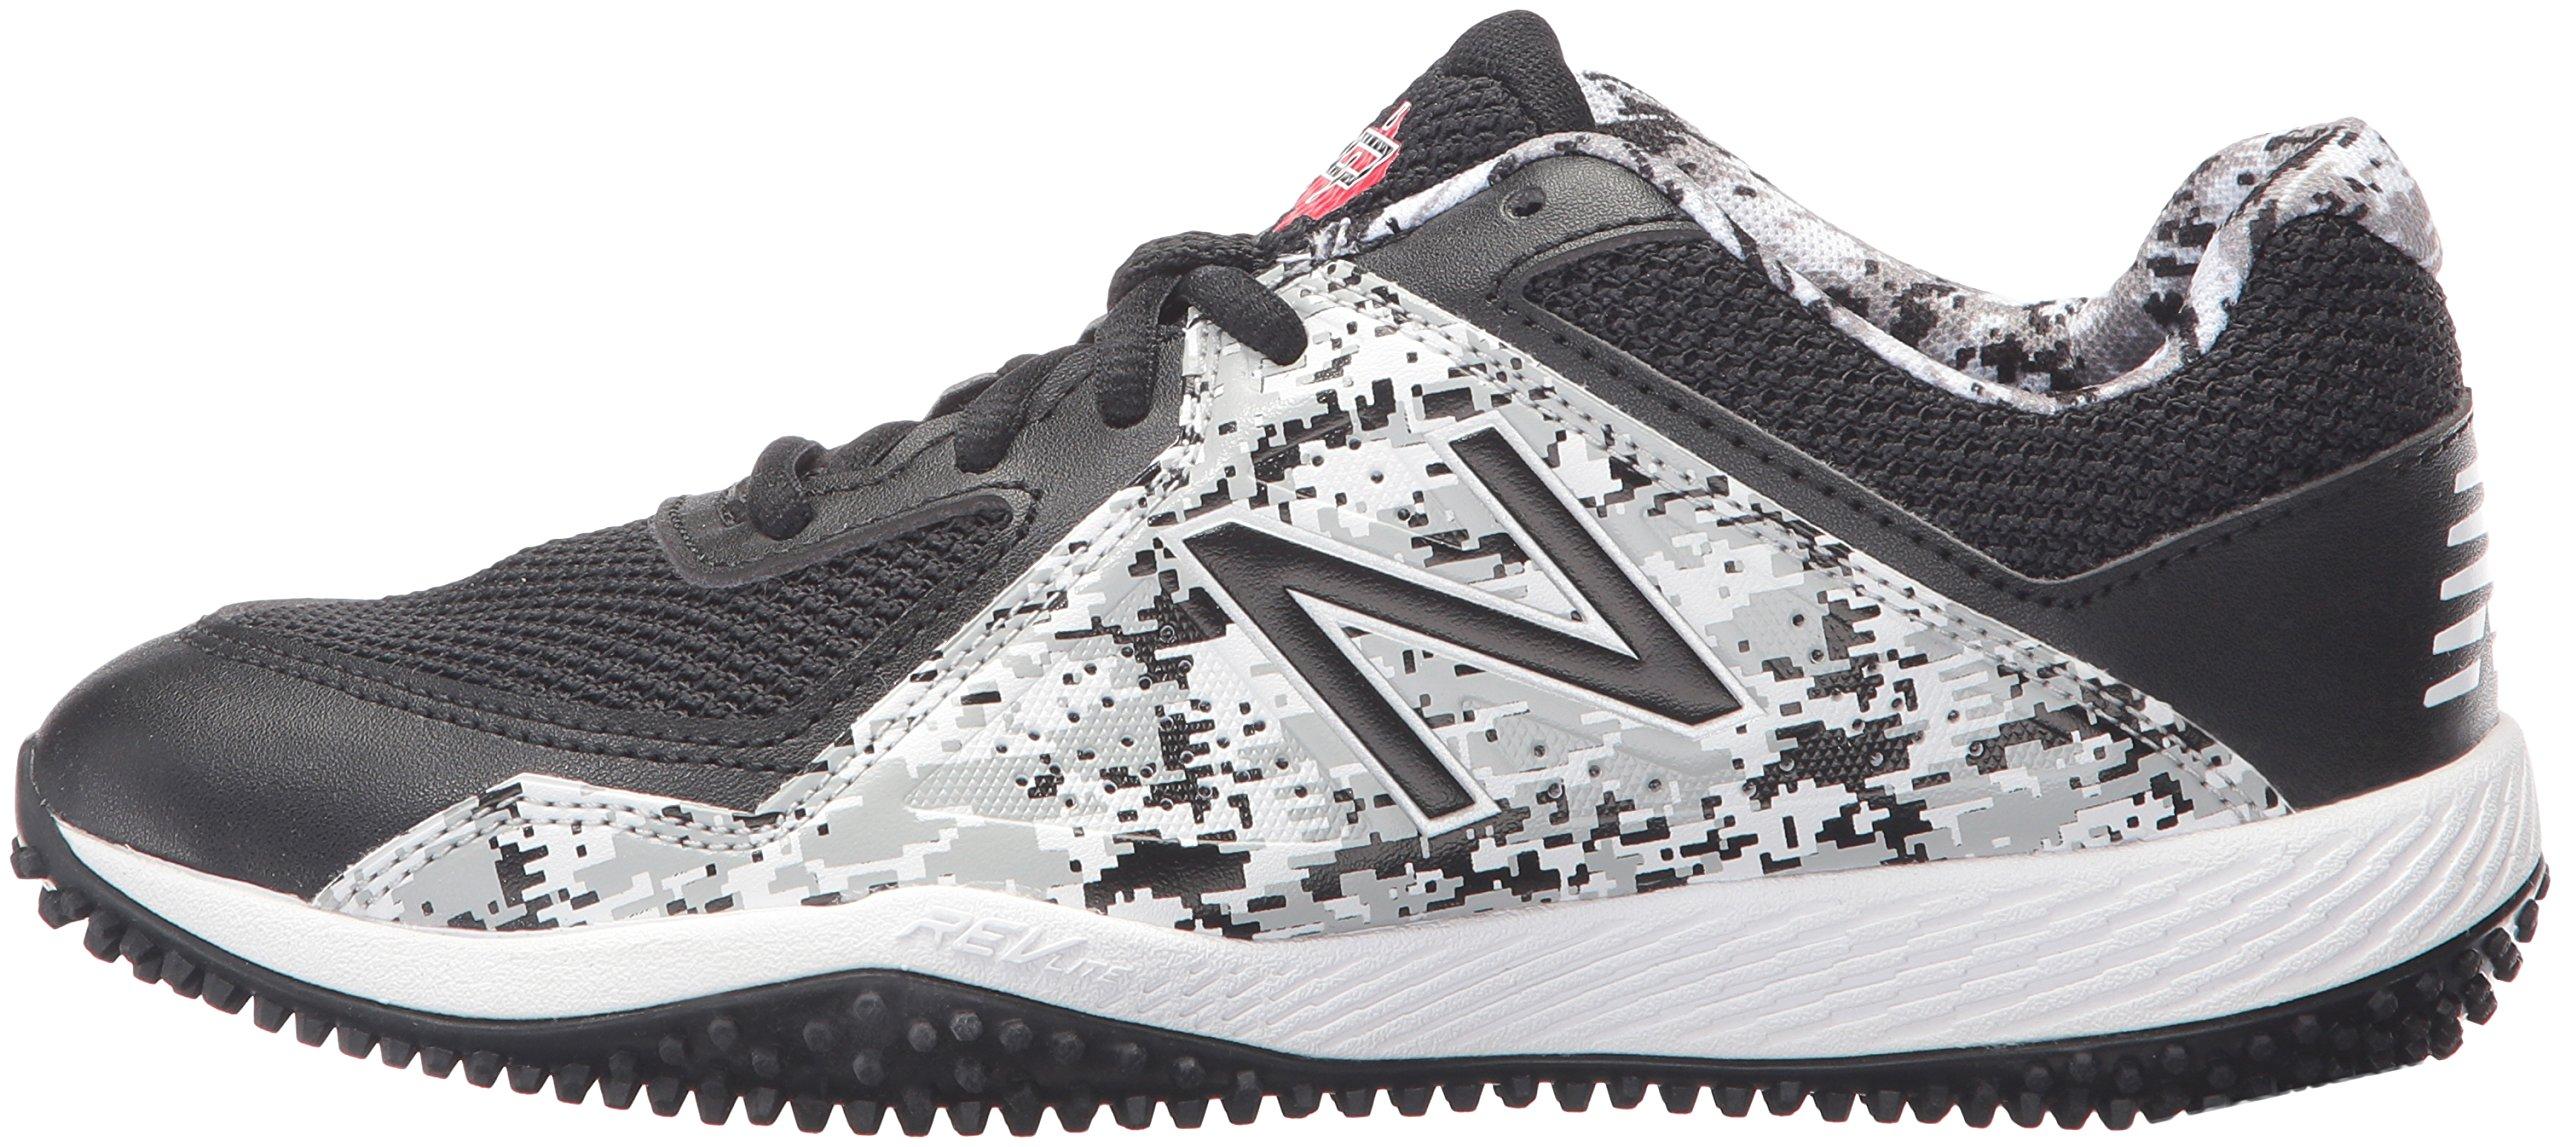 New Balance Boys' TY4040 Turf Baseball Shoe, Black/White, 6 M US Big Kid by New Balance (Image #5)